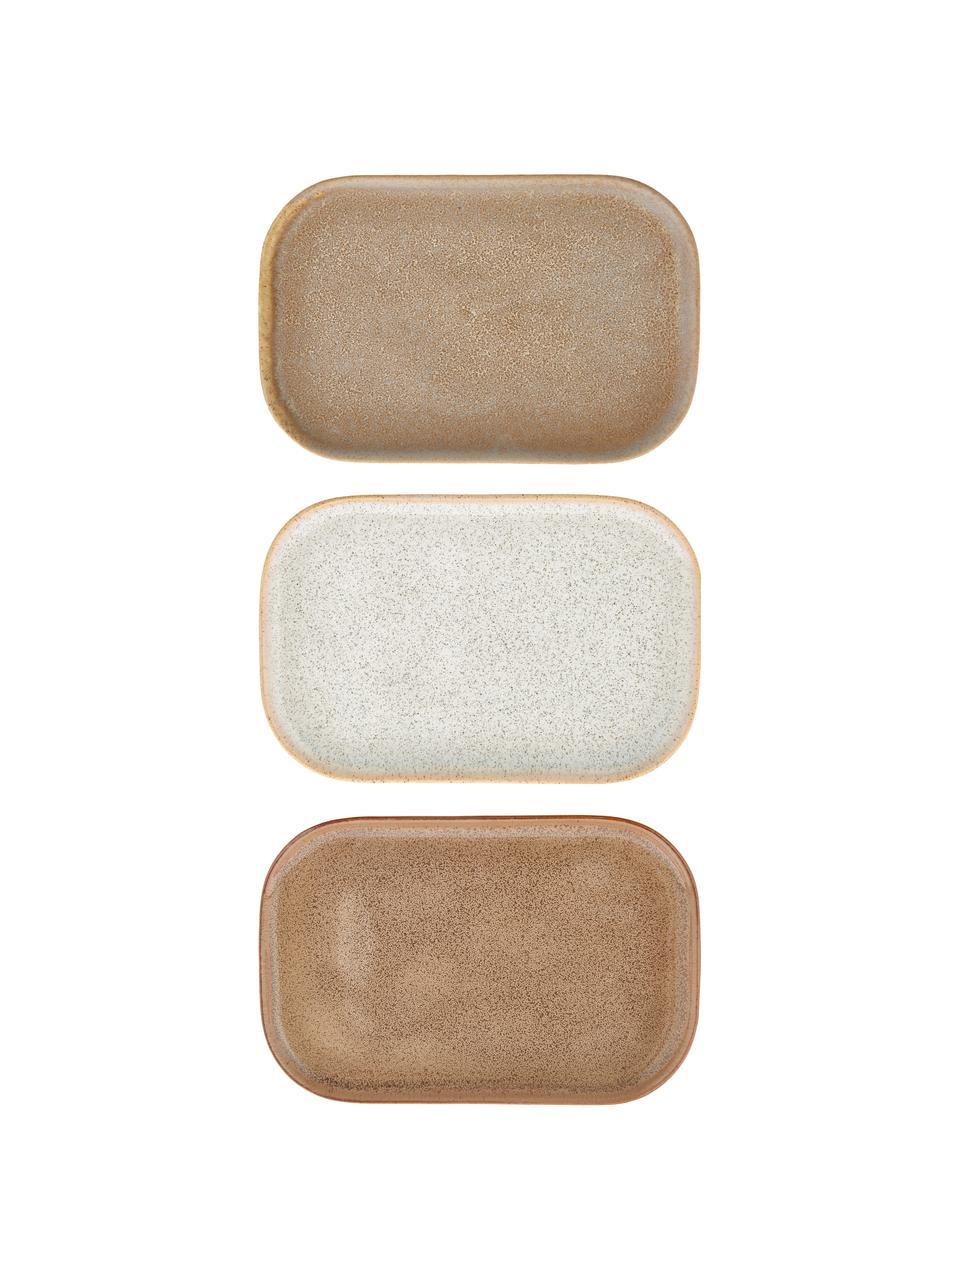 Handgemaakte serveerplateauset Addison, 3-delig, Keramiek, Beige, wit, 15 x 23 cm